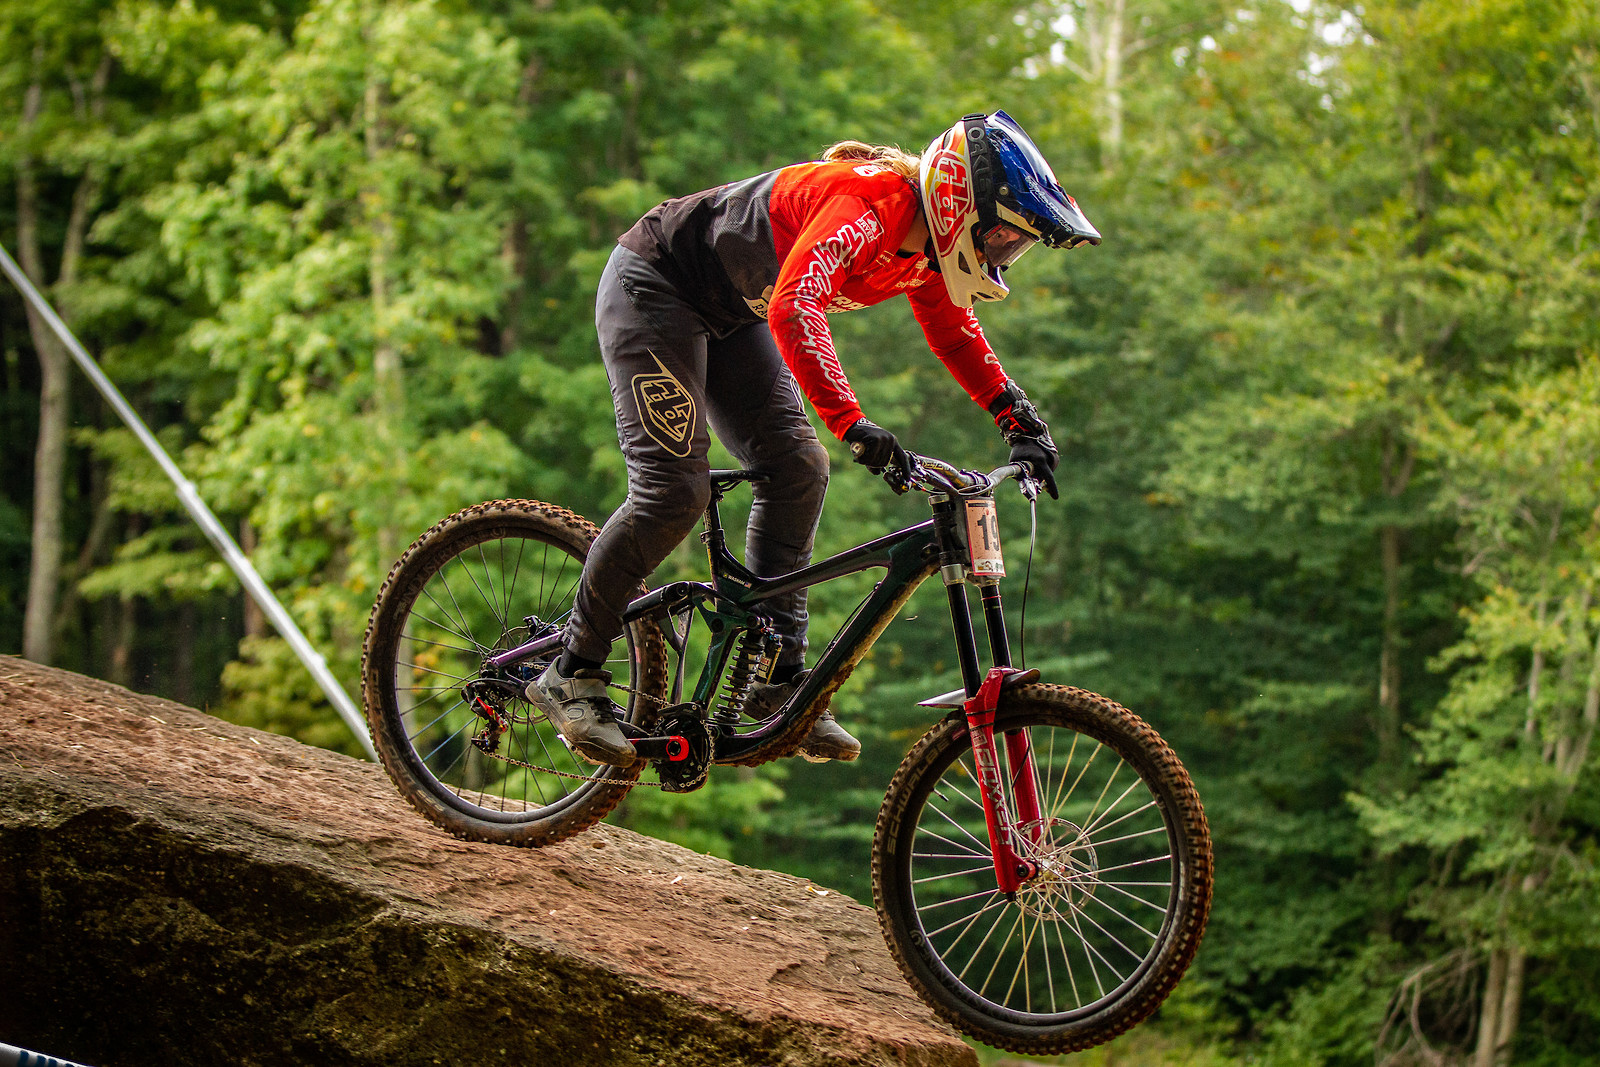 Caroline Washam - JackRice - Mountain Biking Pictures - Vital MTB